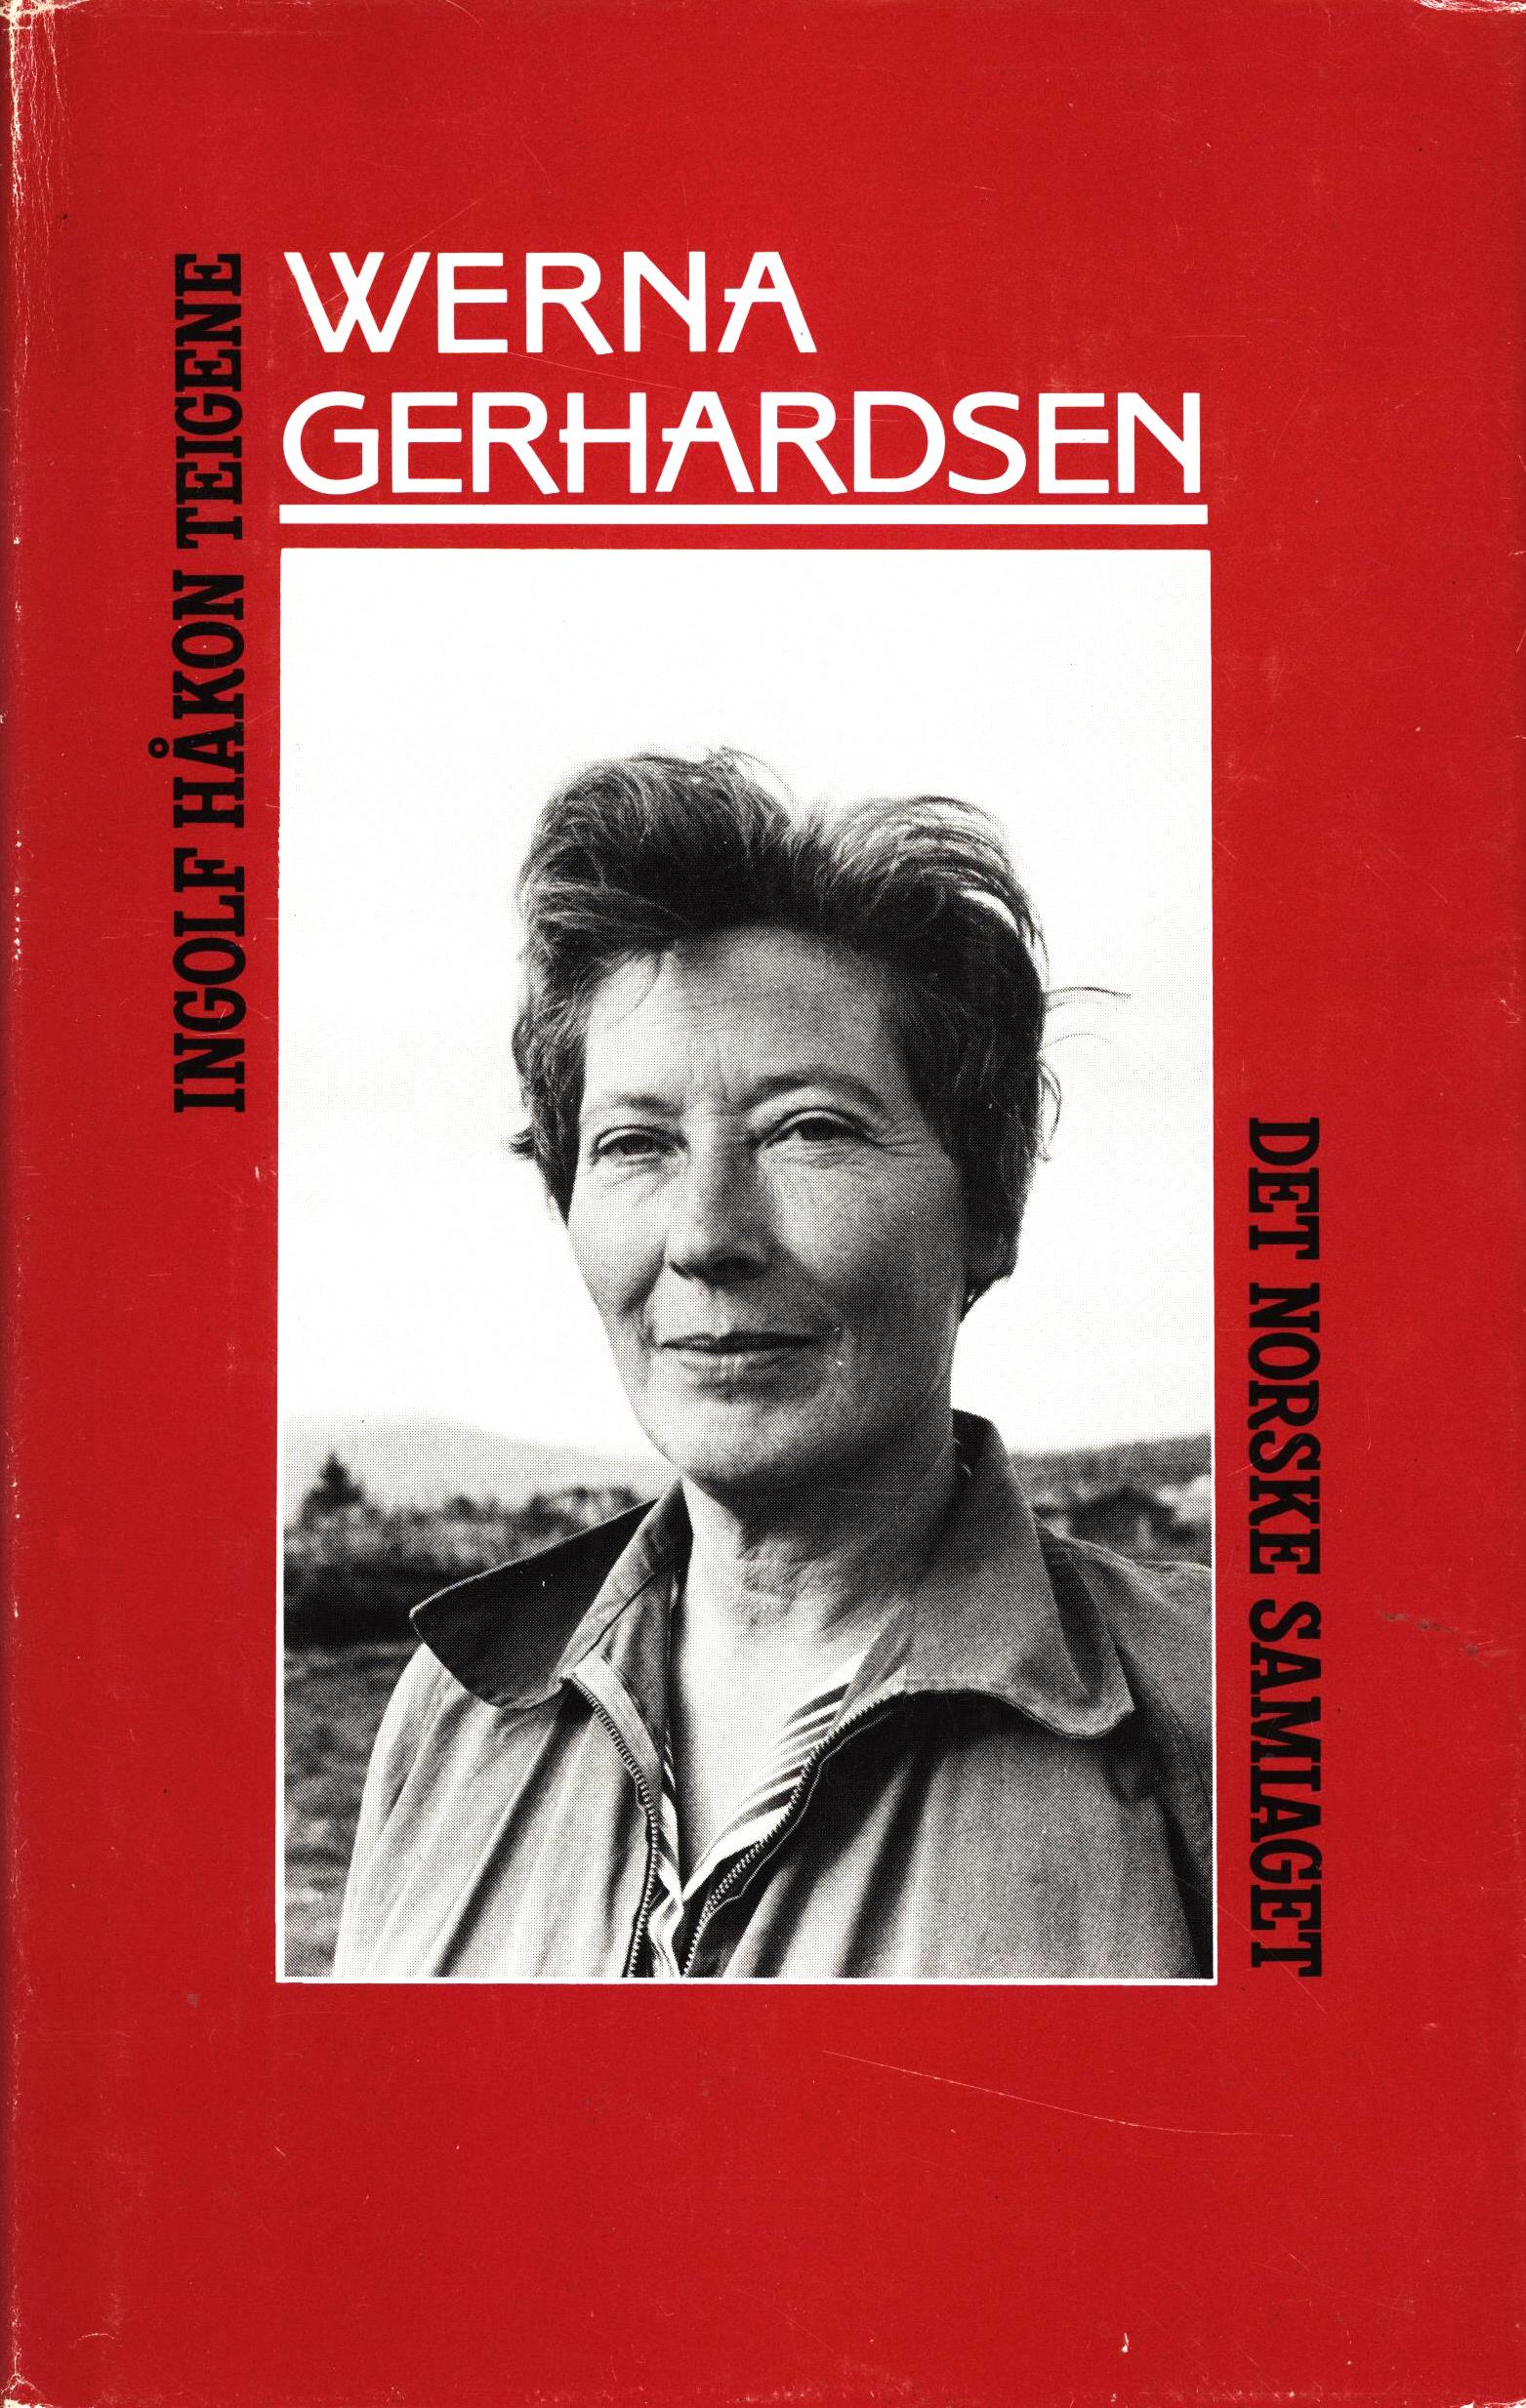 Ingolf Håkon Teigene: Werna Gerhardsen